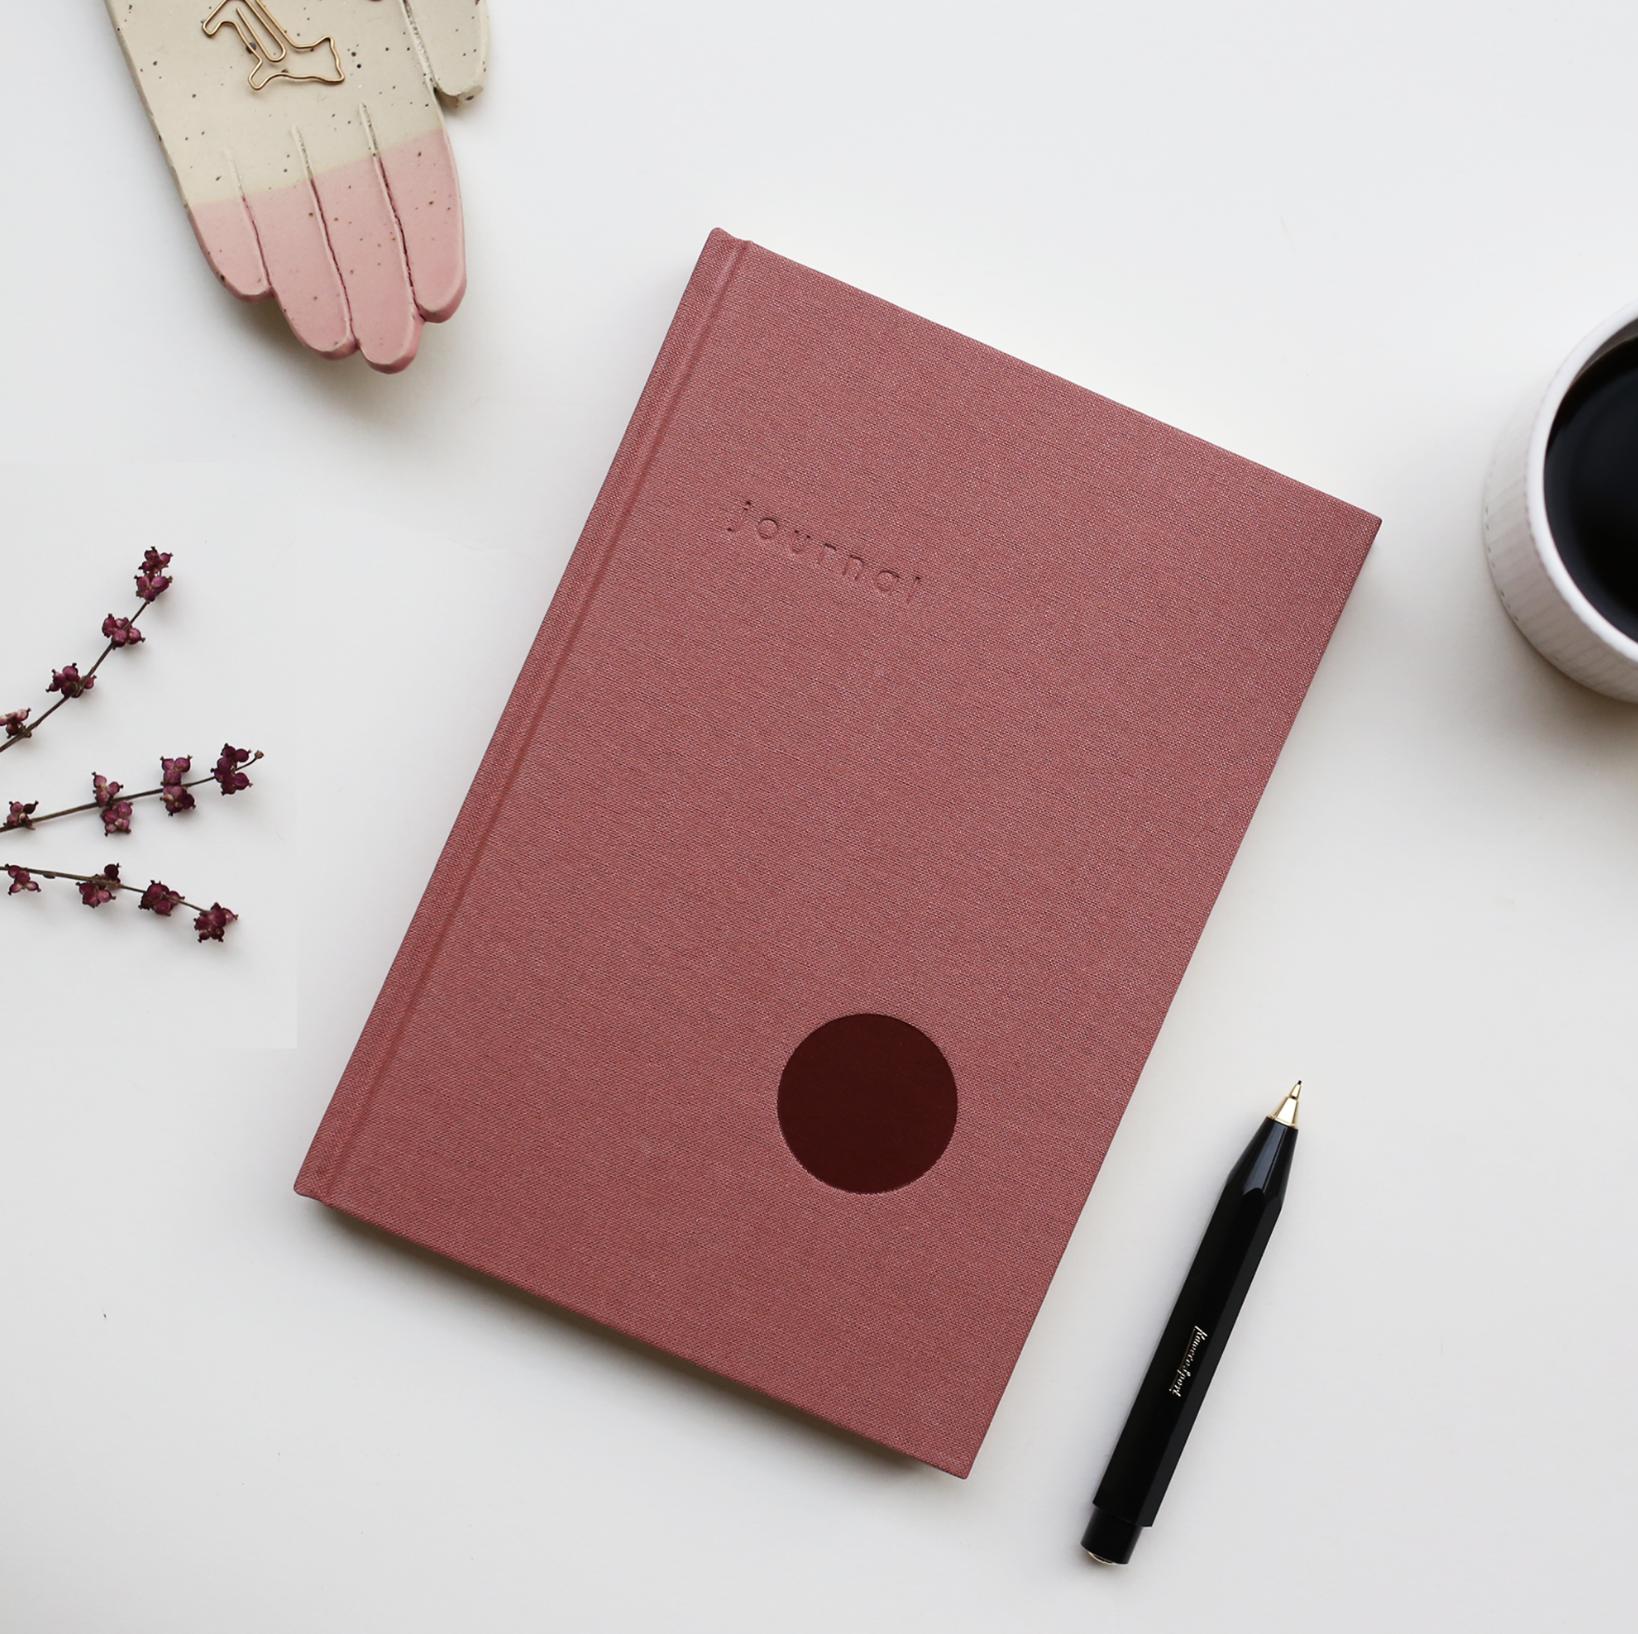 KARTOTEK - Hardcover journal, rose